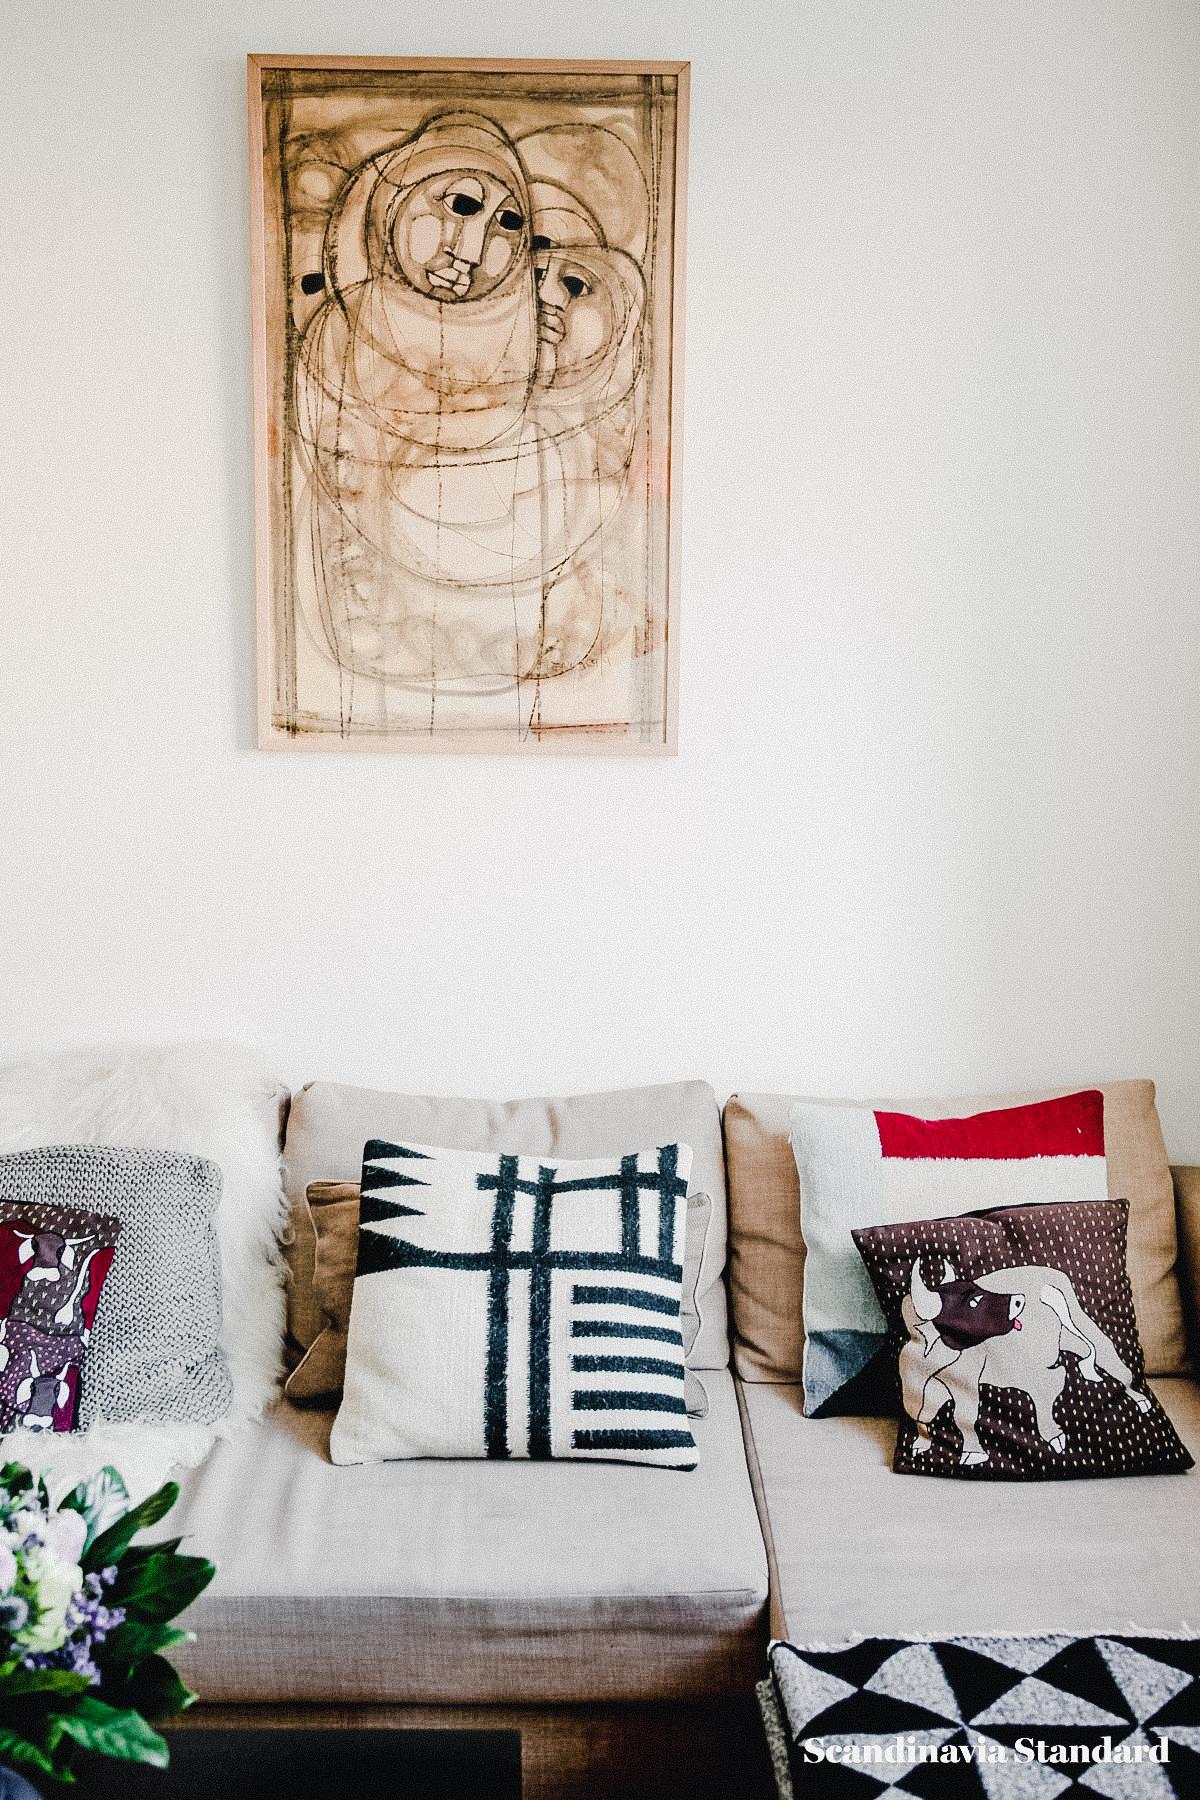 the-white-room-rebeccas-nordvest-apartment-copenhagen-interiors-scandianvia-standard-8504